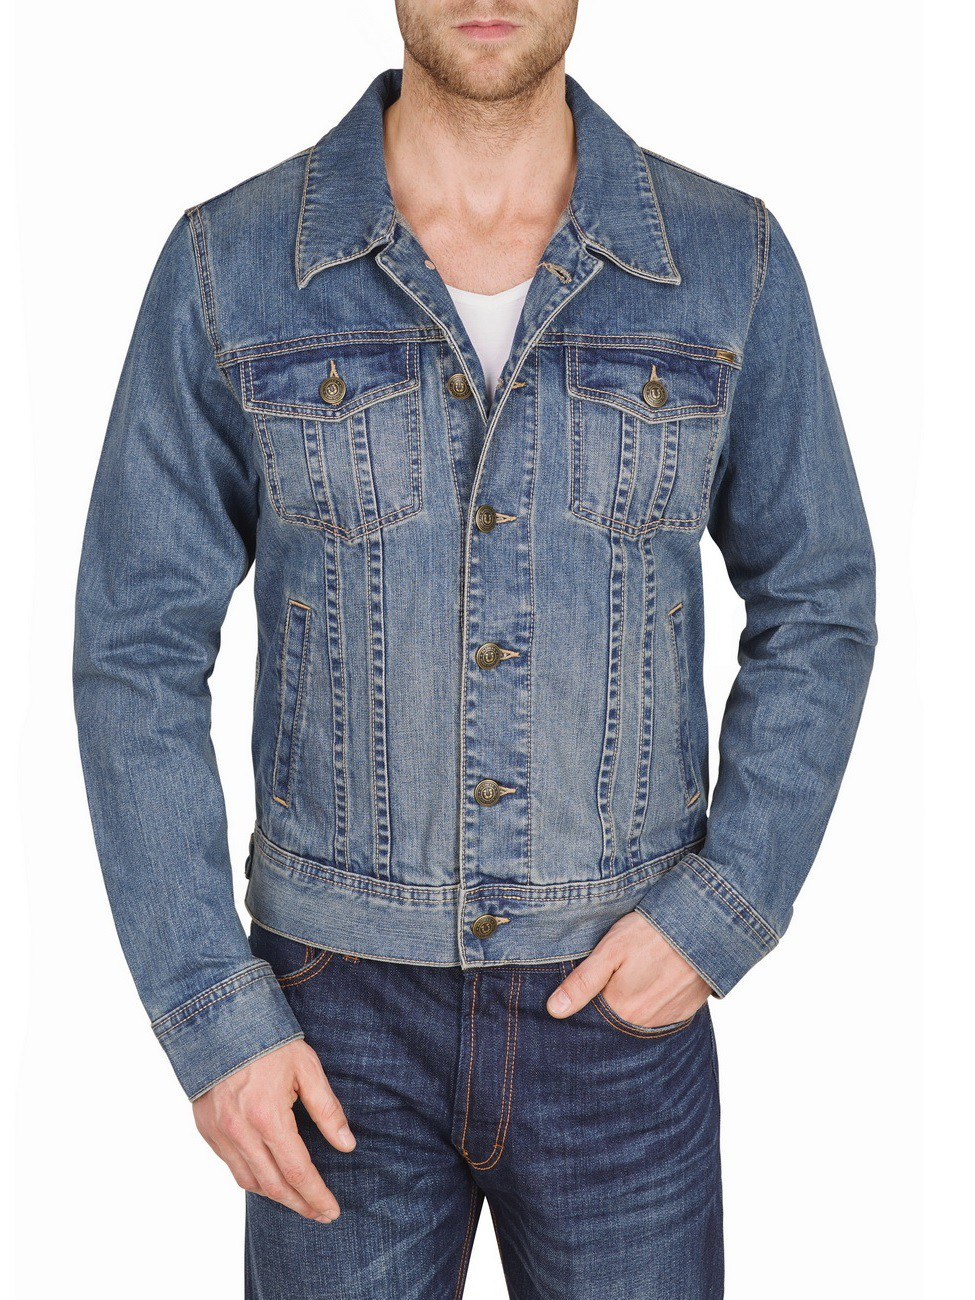 paddock s herren jeansjacke western jacket blau kaufen. Black Bedroom Furniture Sets. Home Design Ideas